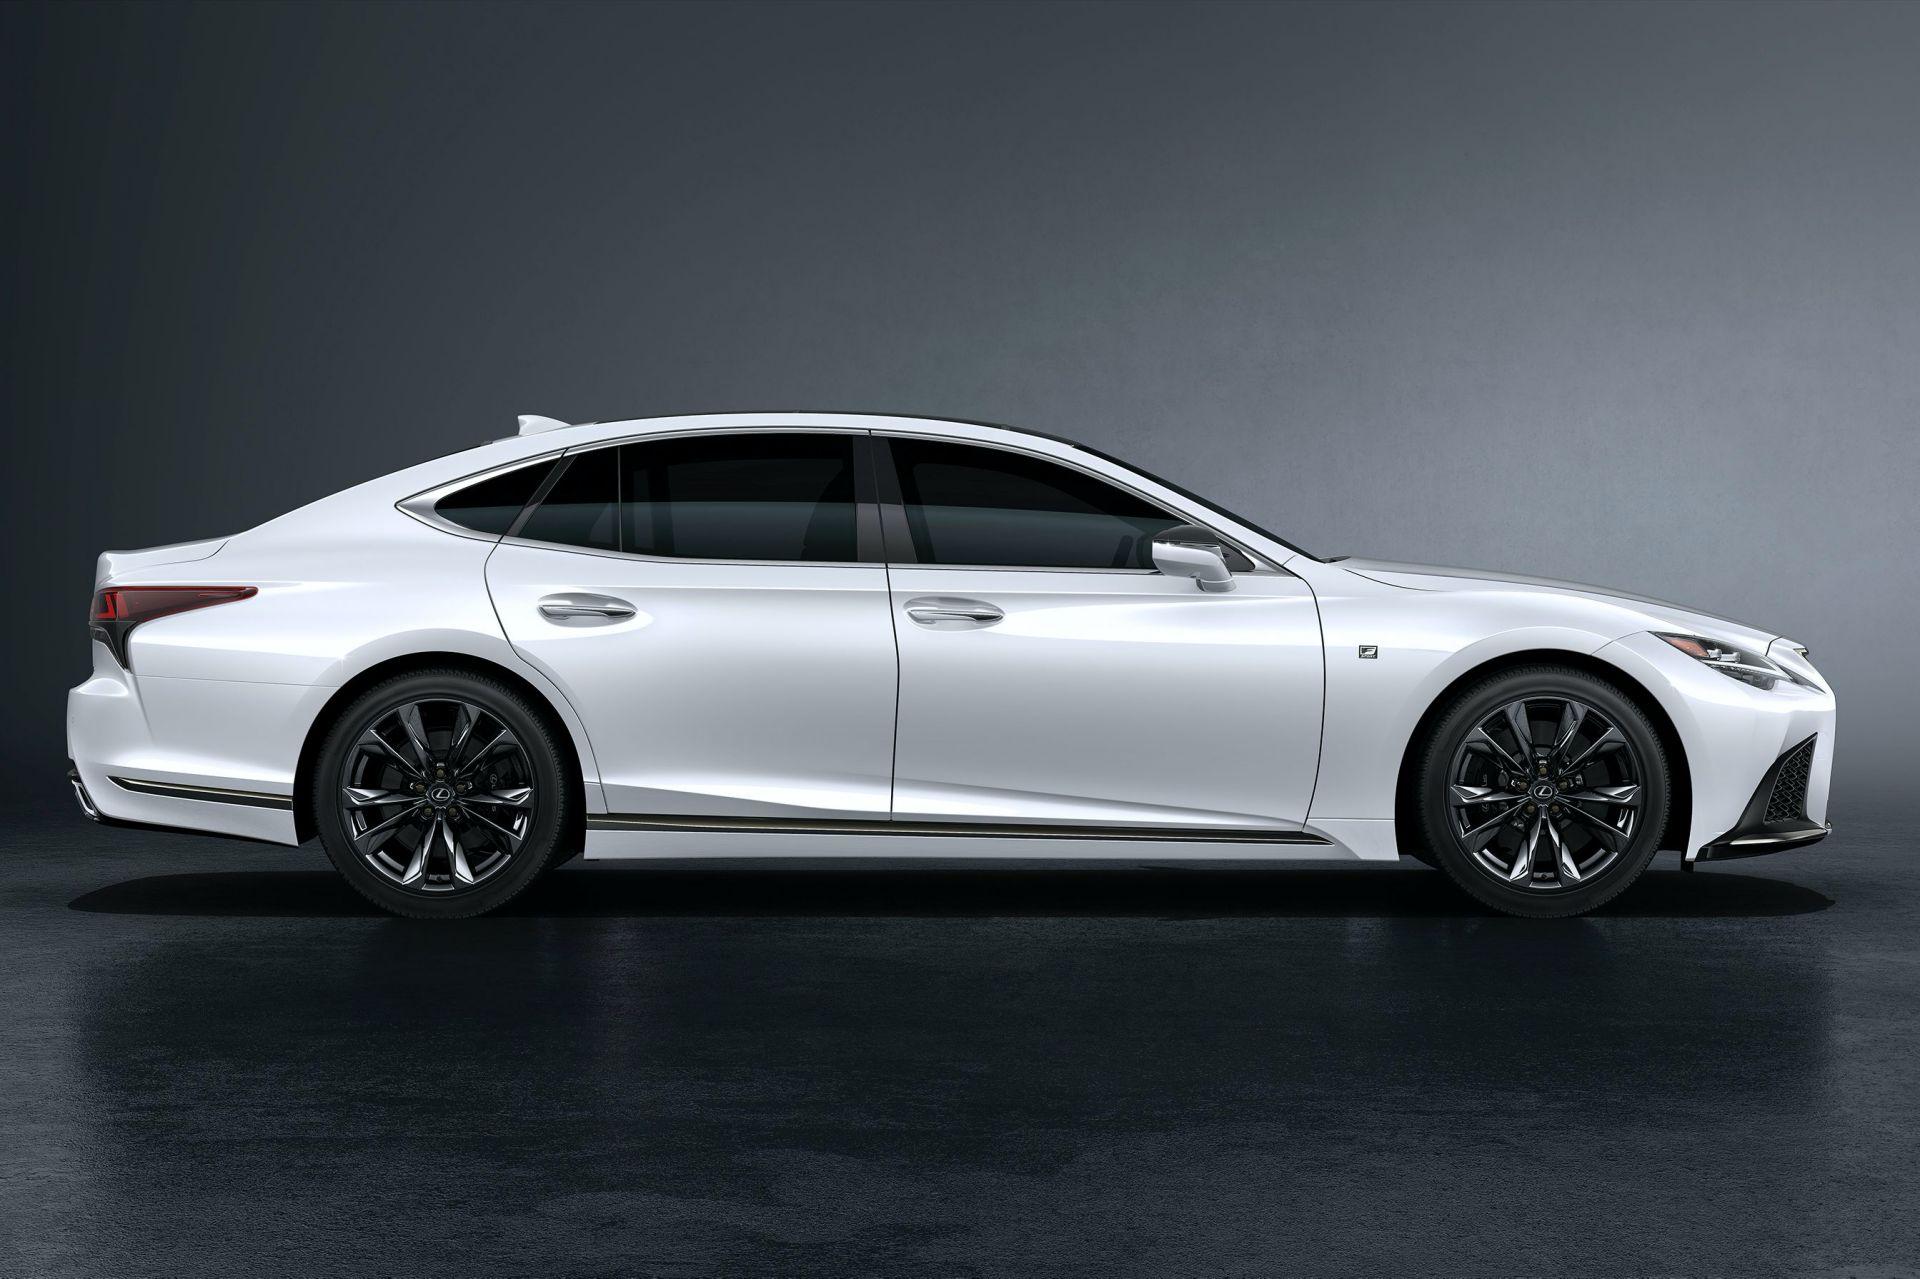 2021-lexus-ls-facelift-4.jpg